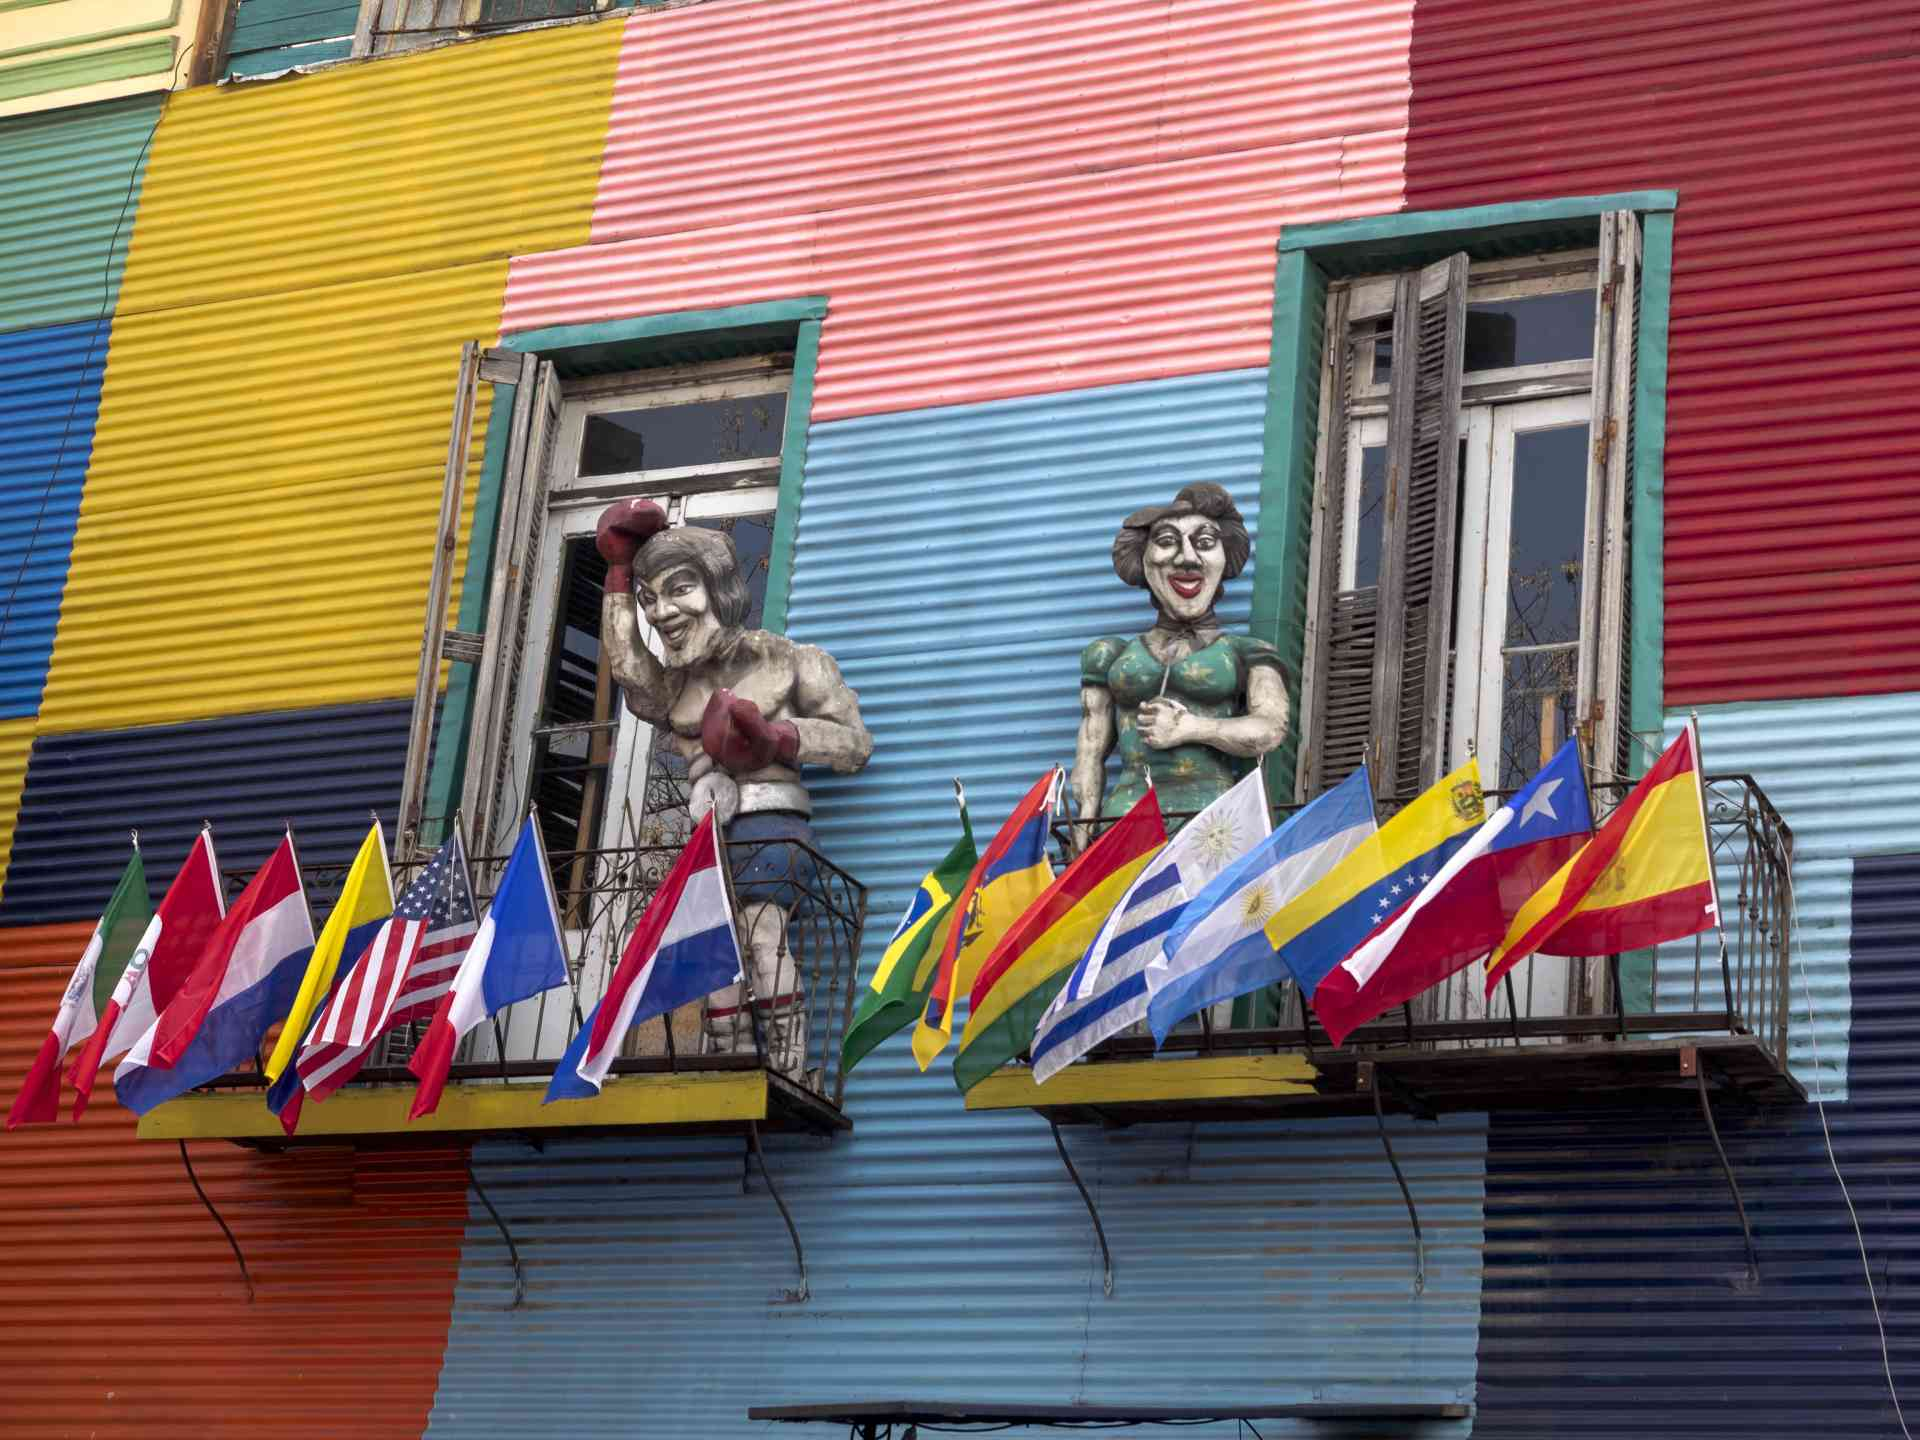 Buenos Aires, Argentina by David Hein